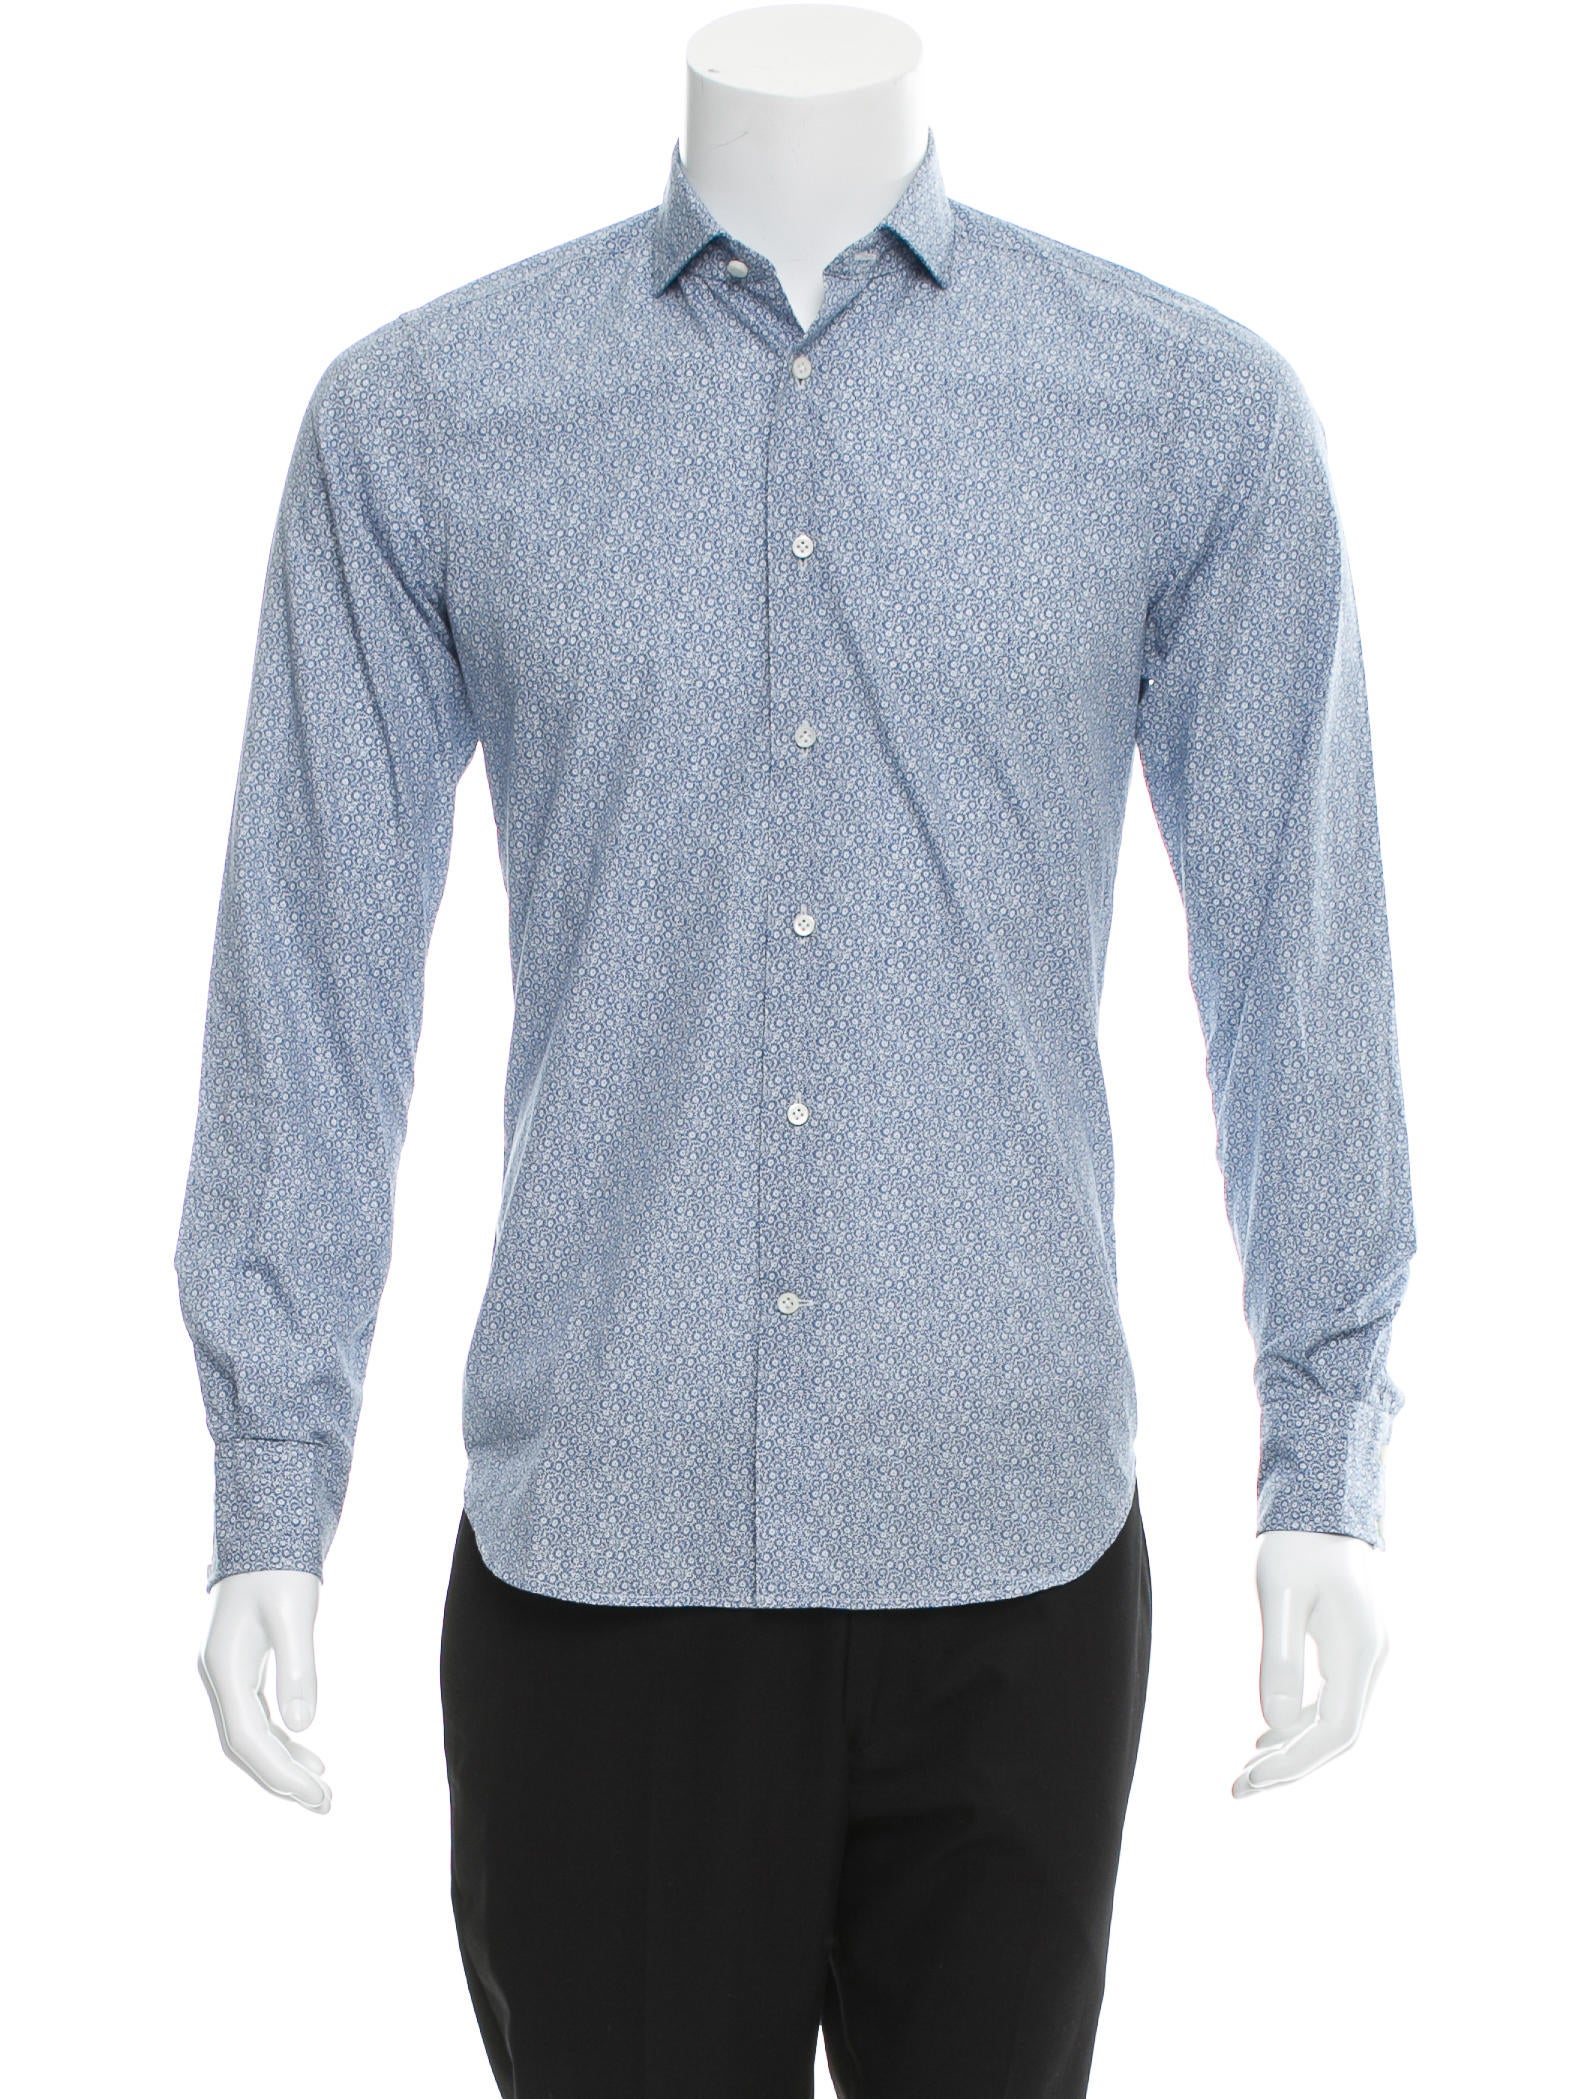 Ari floral print button up shirt w tags clothing for Floral print button up shirt